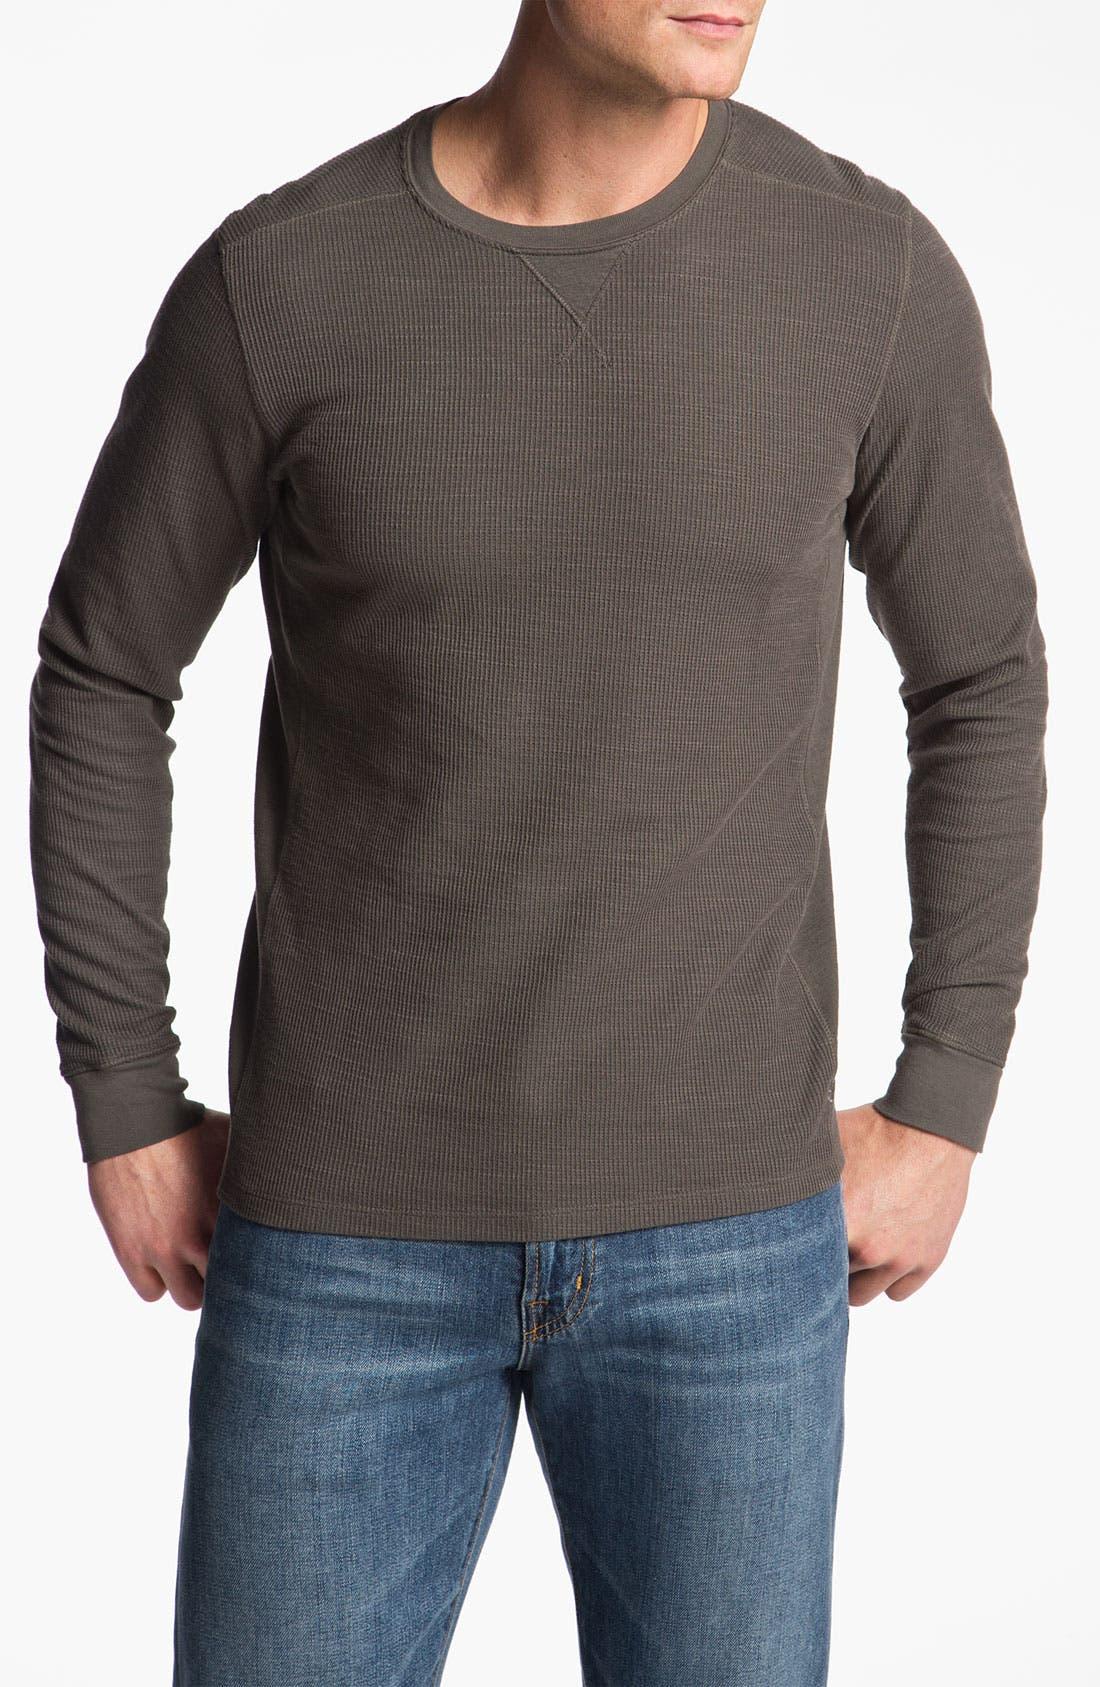 Main Image - AG Jeans Long Sleeve Crewneck Thermal Shirt